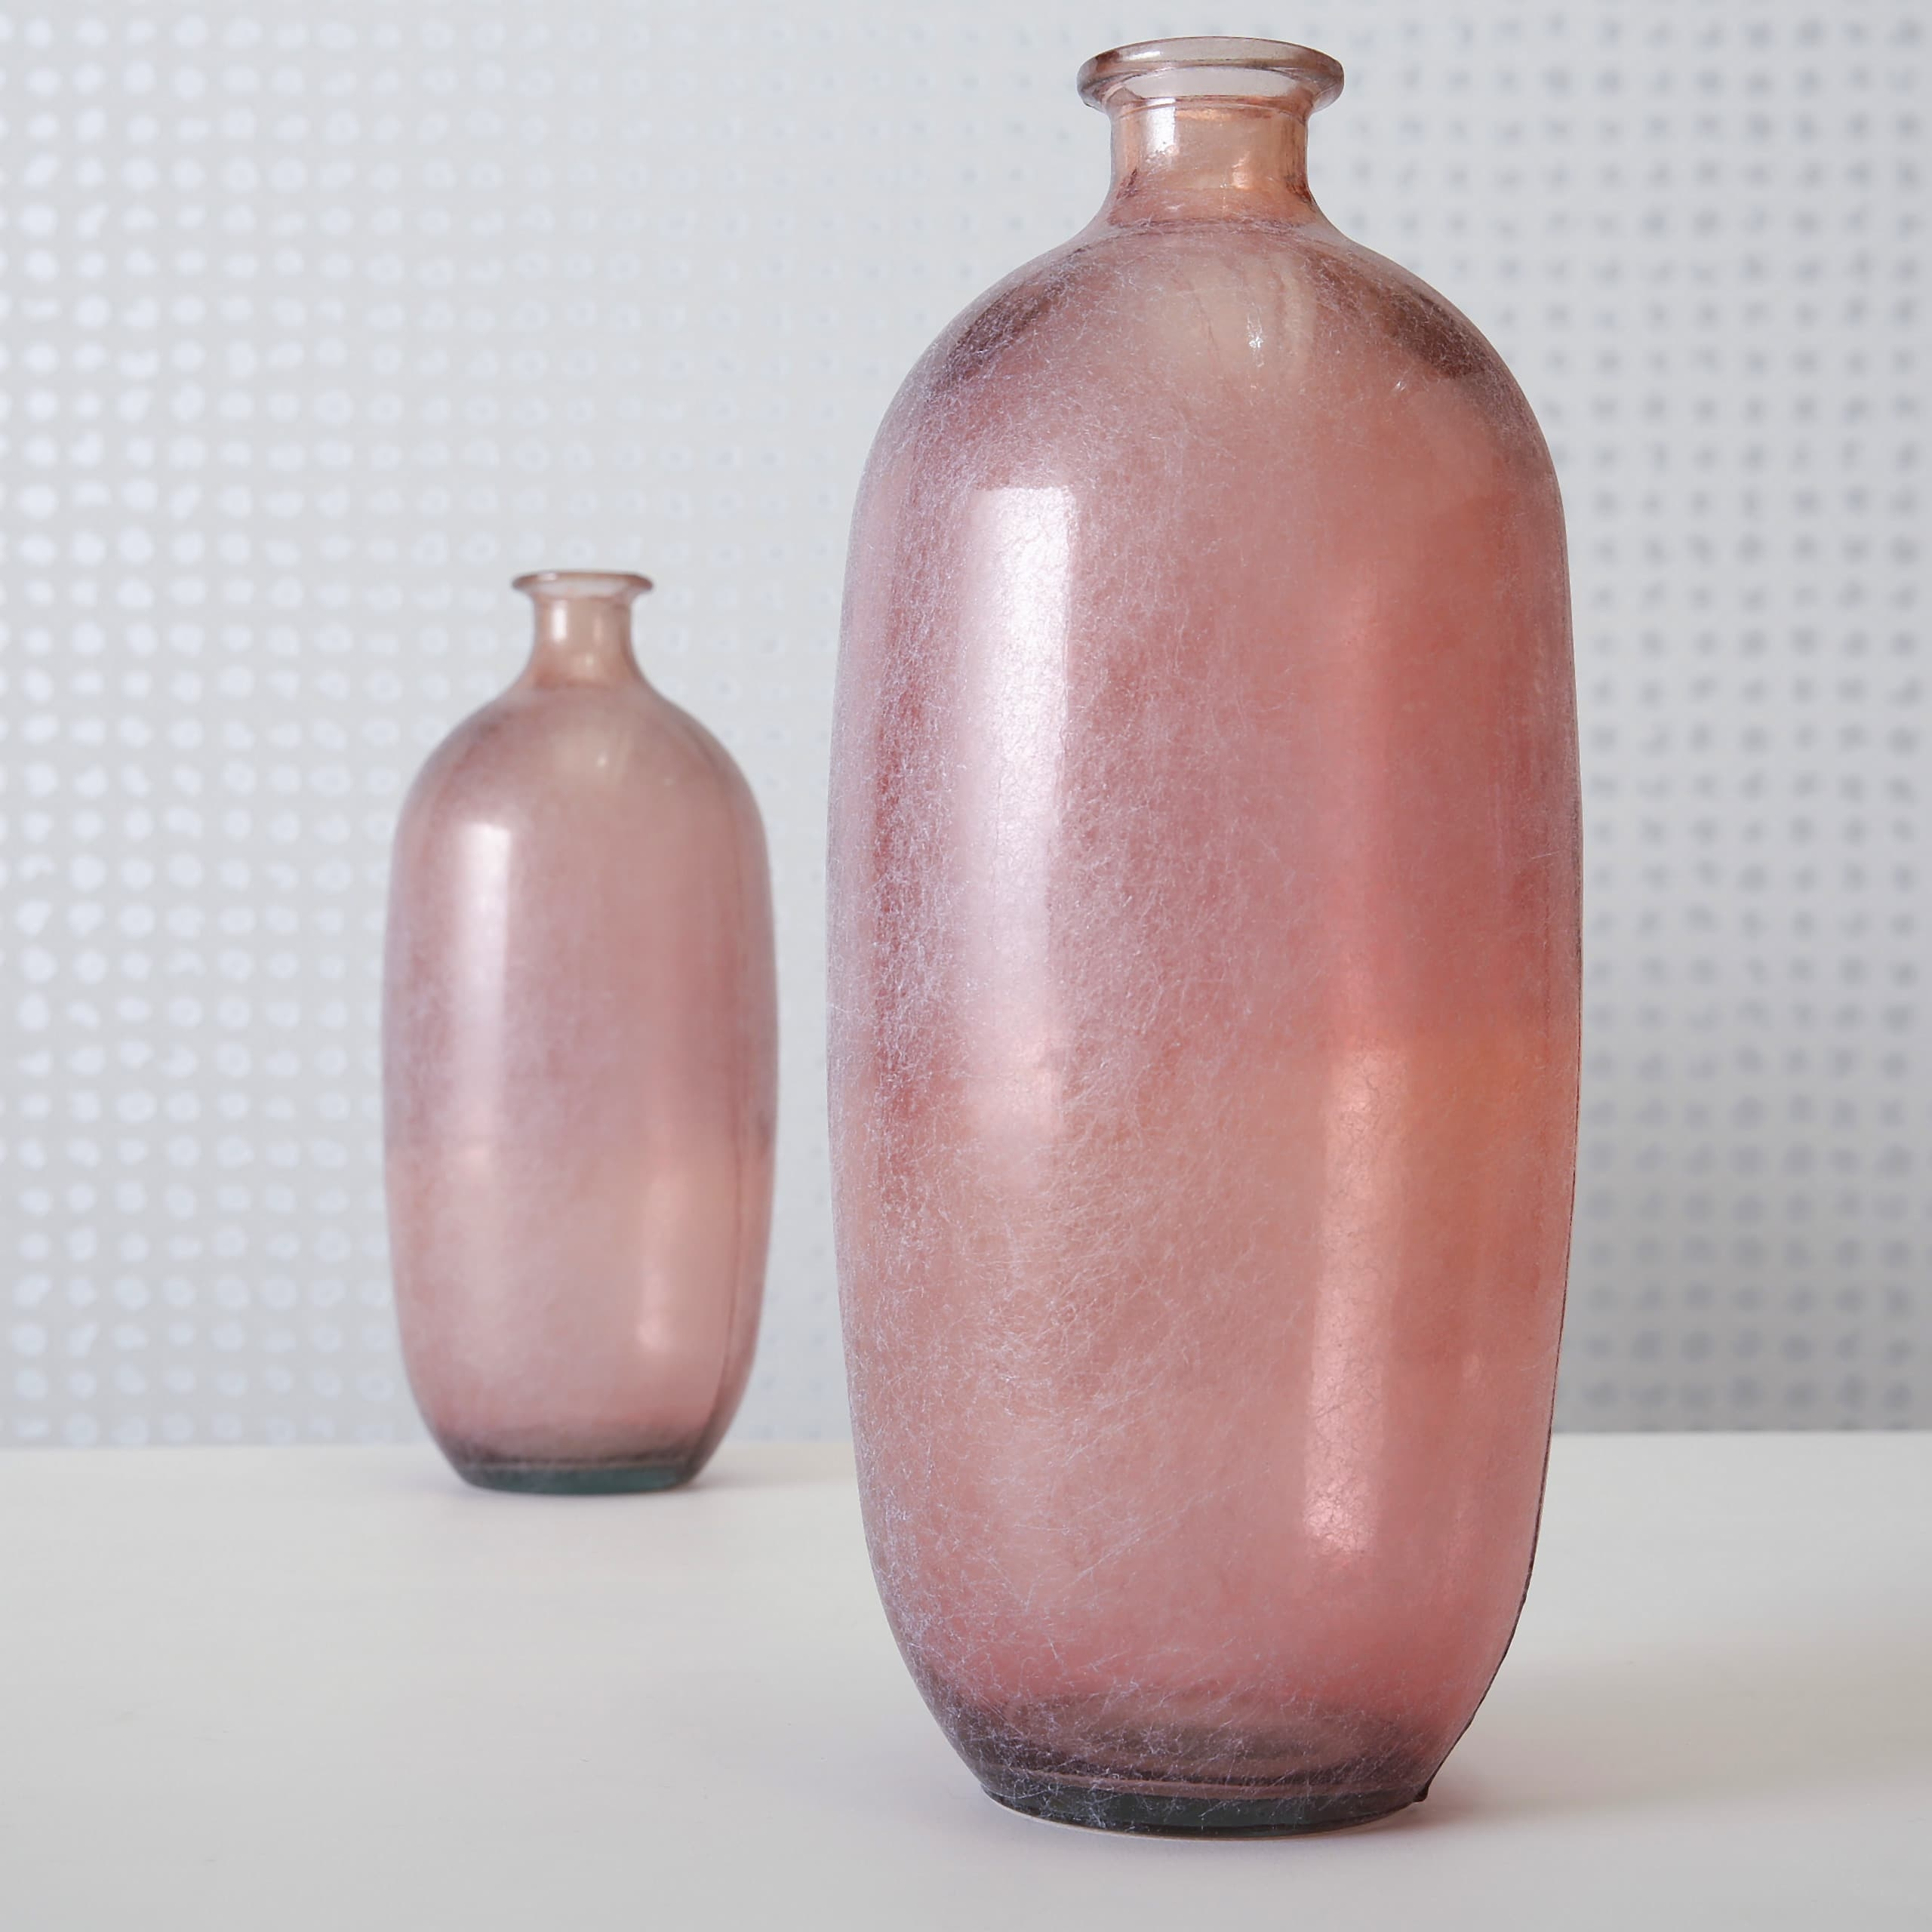 Vaza decorativa din sticla reciclata Alicia Big Roz, Ø19xH45 cm poza